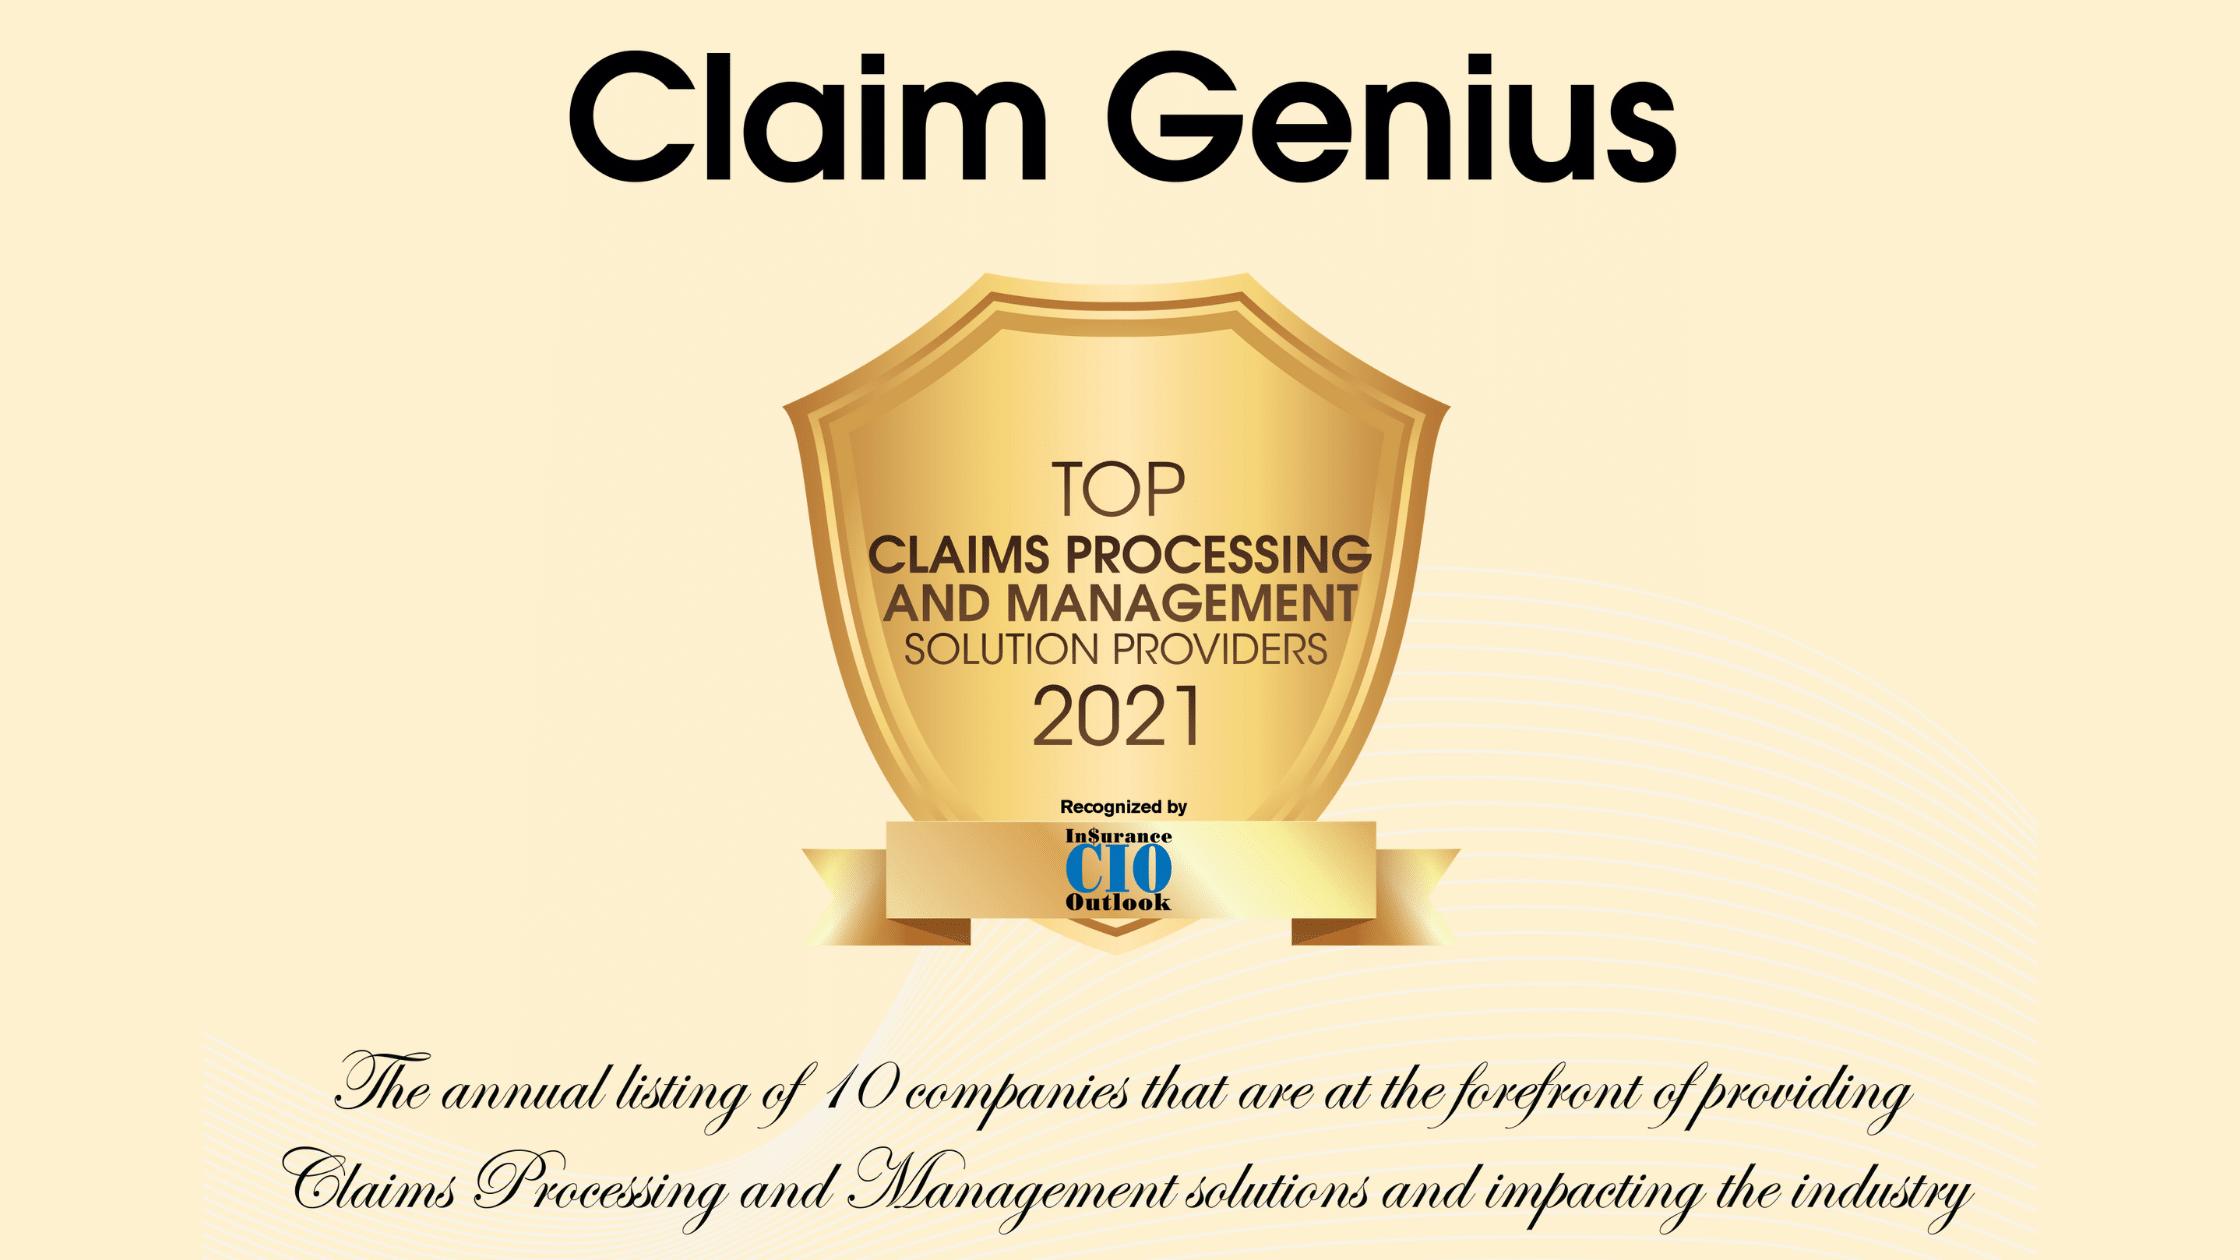 Insurance CIO Outlook Award Certificate